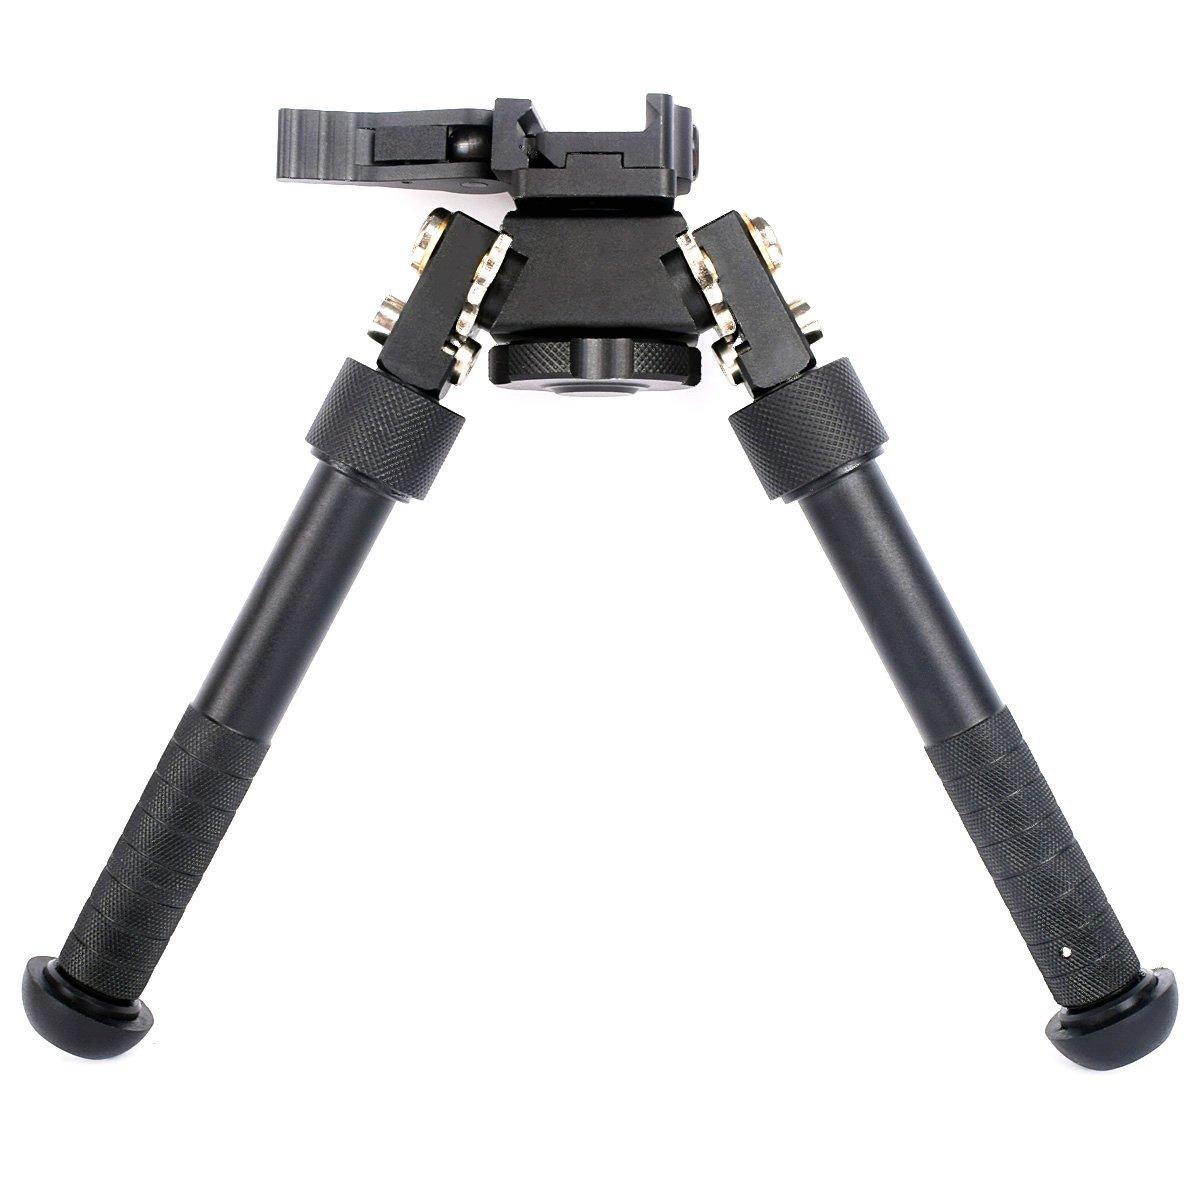 Rifle Bipod CNC QD Tactical Picatinny Rail Bipod Flat Adjustable (Black) by CRUSHUNT